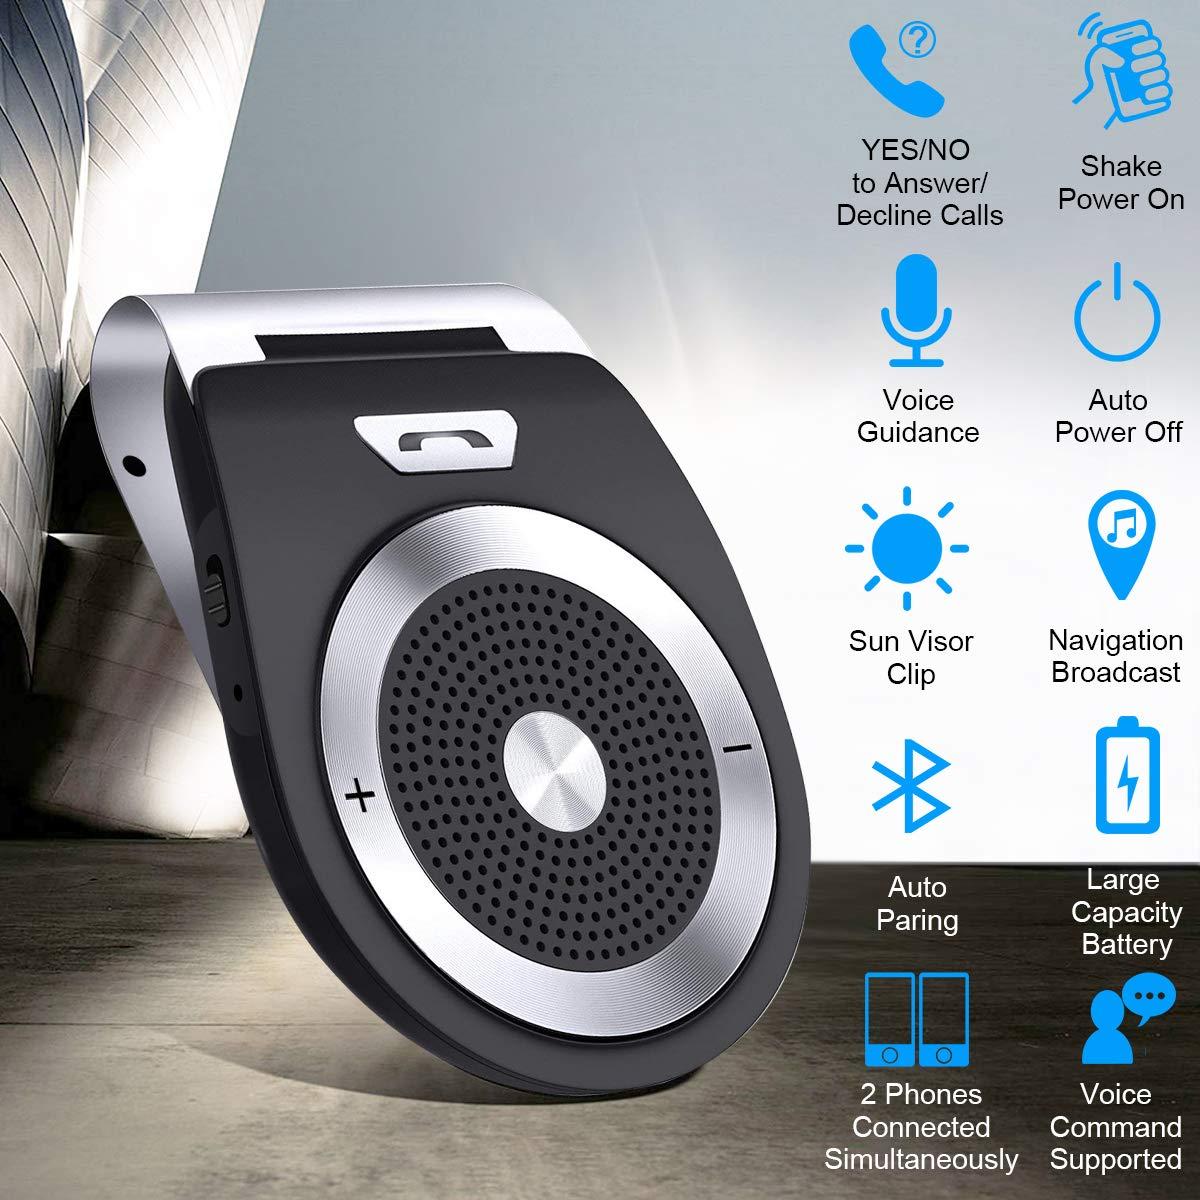 Bluetooth inalámbrico Coche Manos Libres, Kit de Manos Libres Visor Coche con la última versión 4.1 para iPhone, Samsung, HTC, LG, teléfonos Android: ...